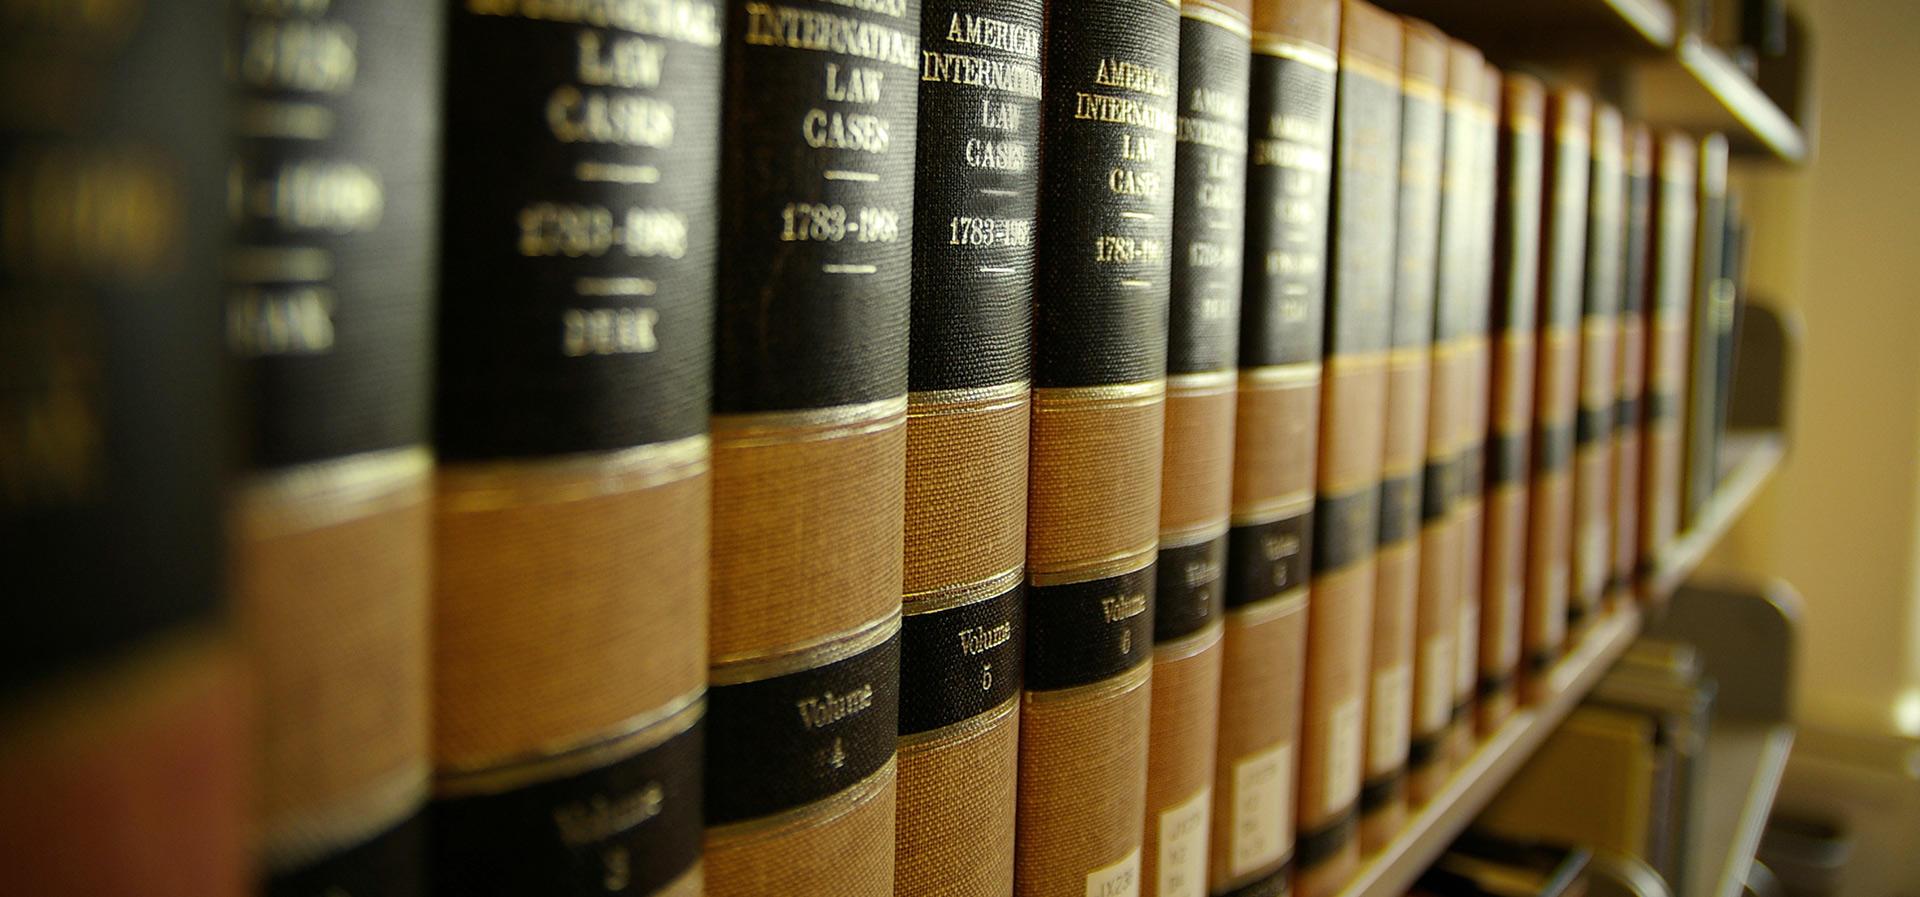 Ronald J. Mone P.C., Attorney at Law image 2